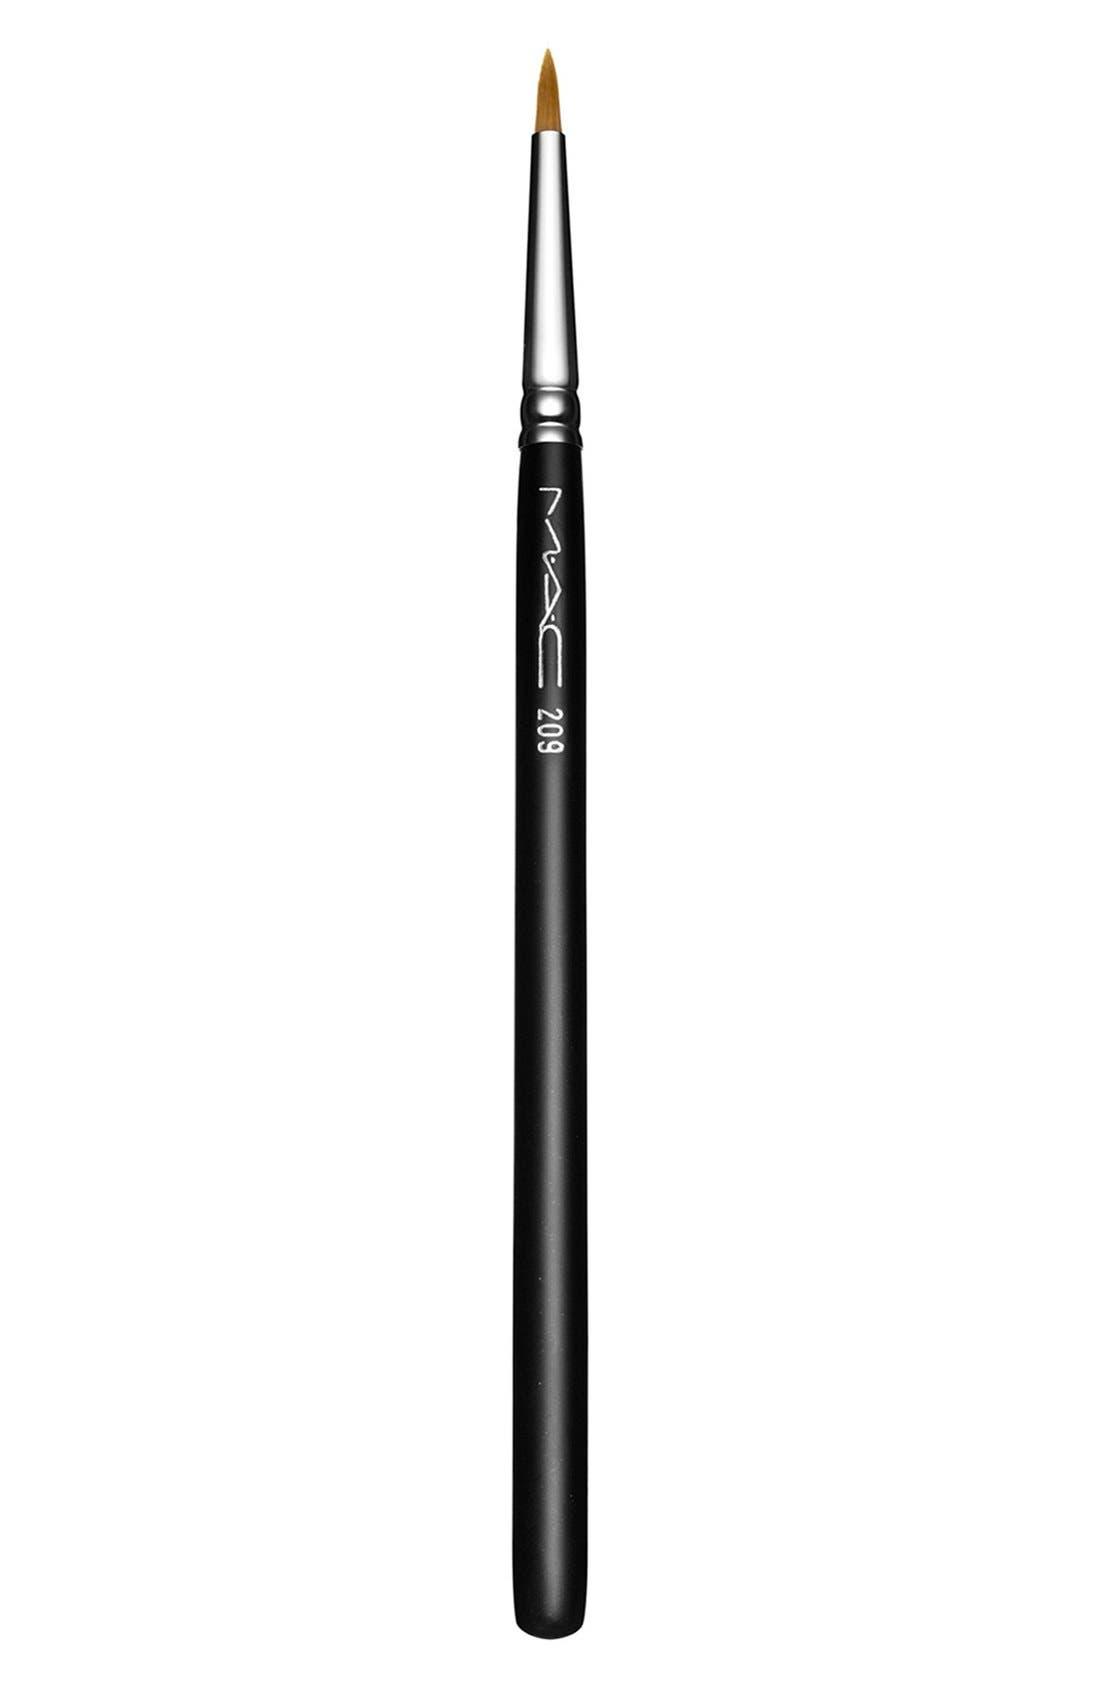 MAC 209 Eyeliner Brush | Nordstrom